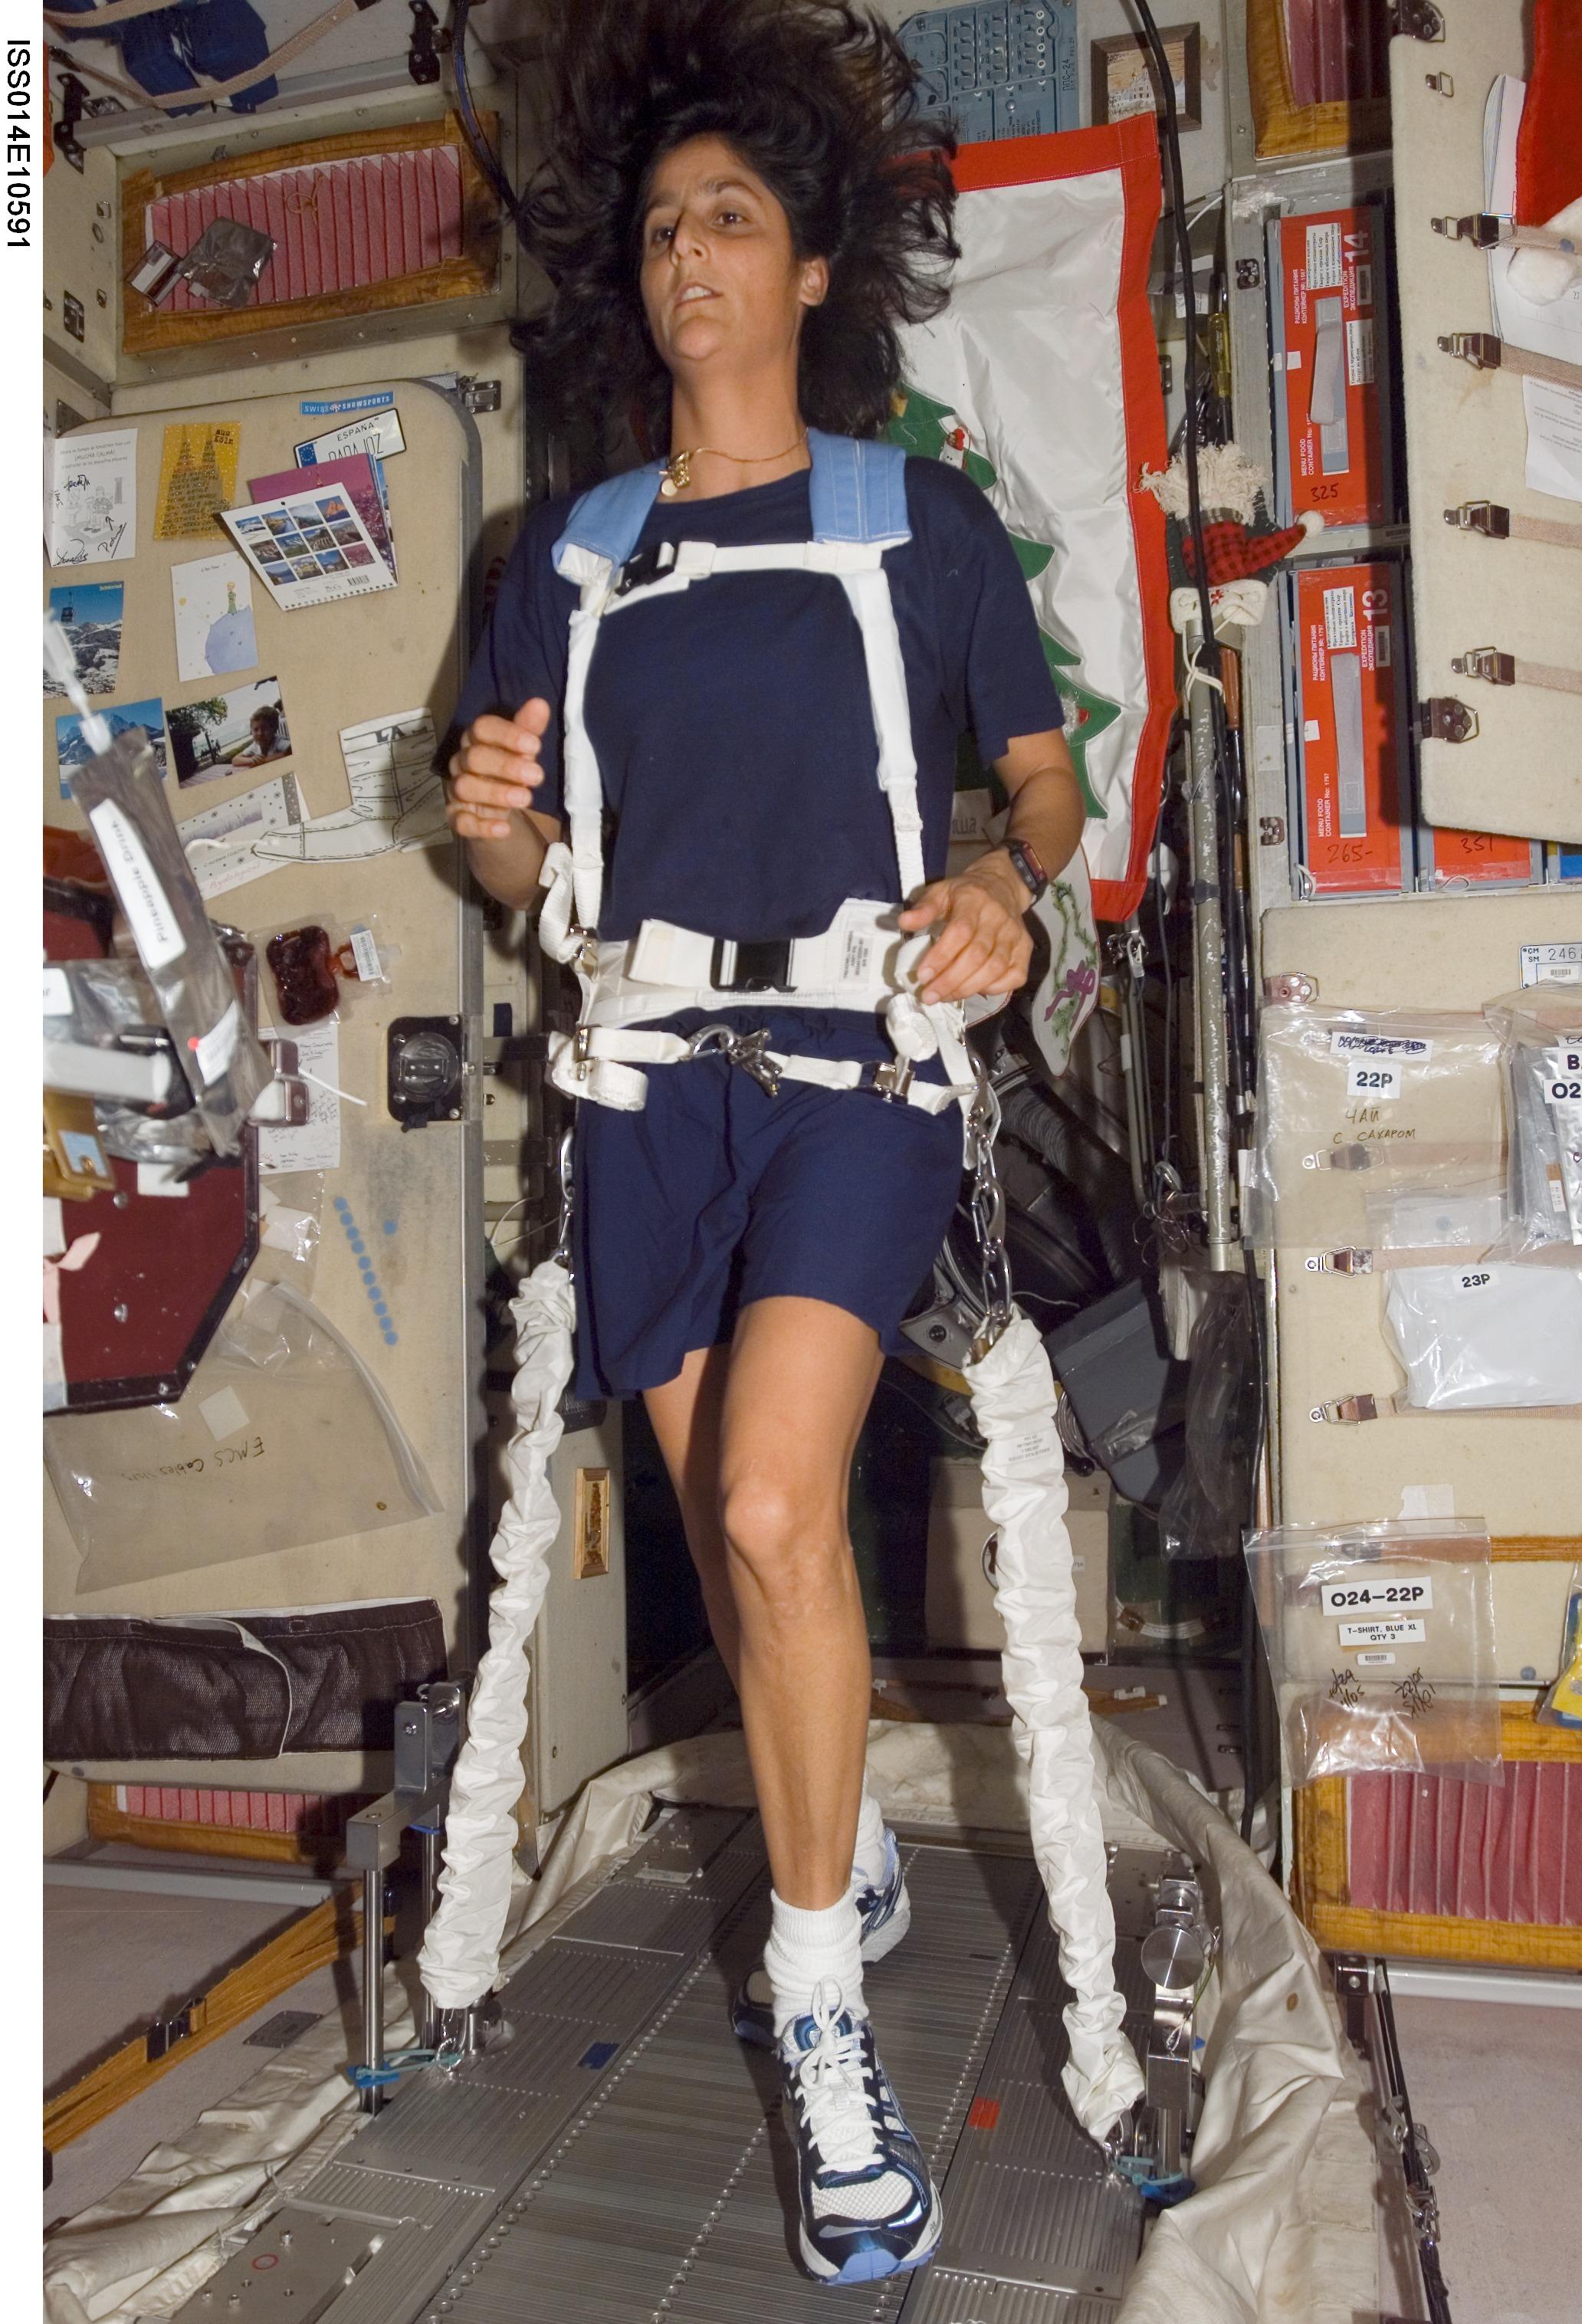 suni williams astronaut - photo #23